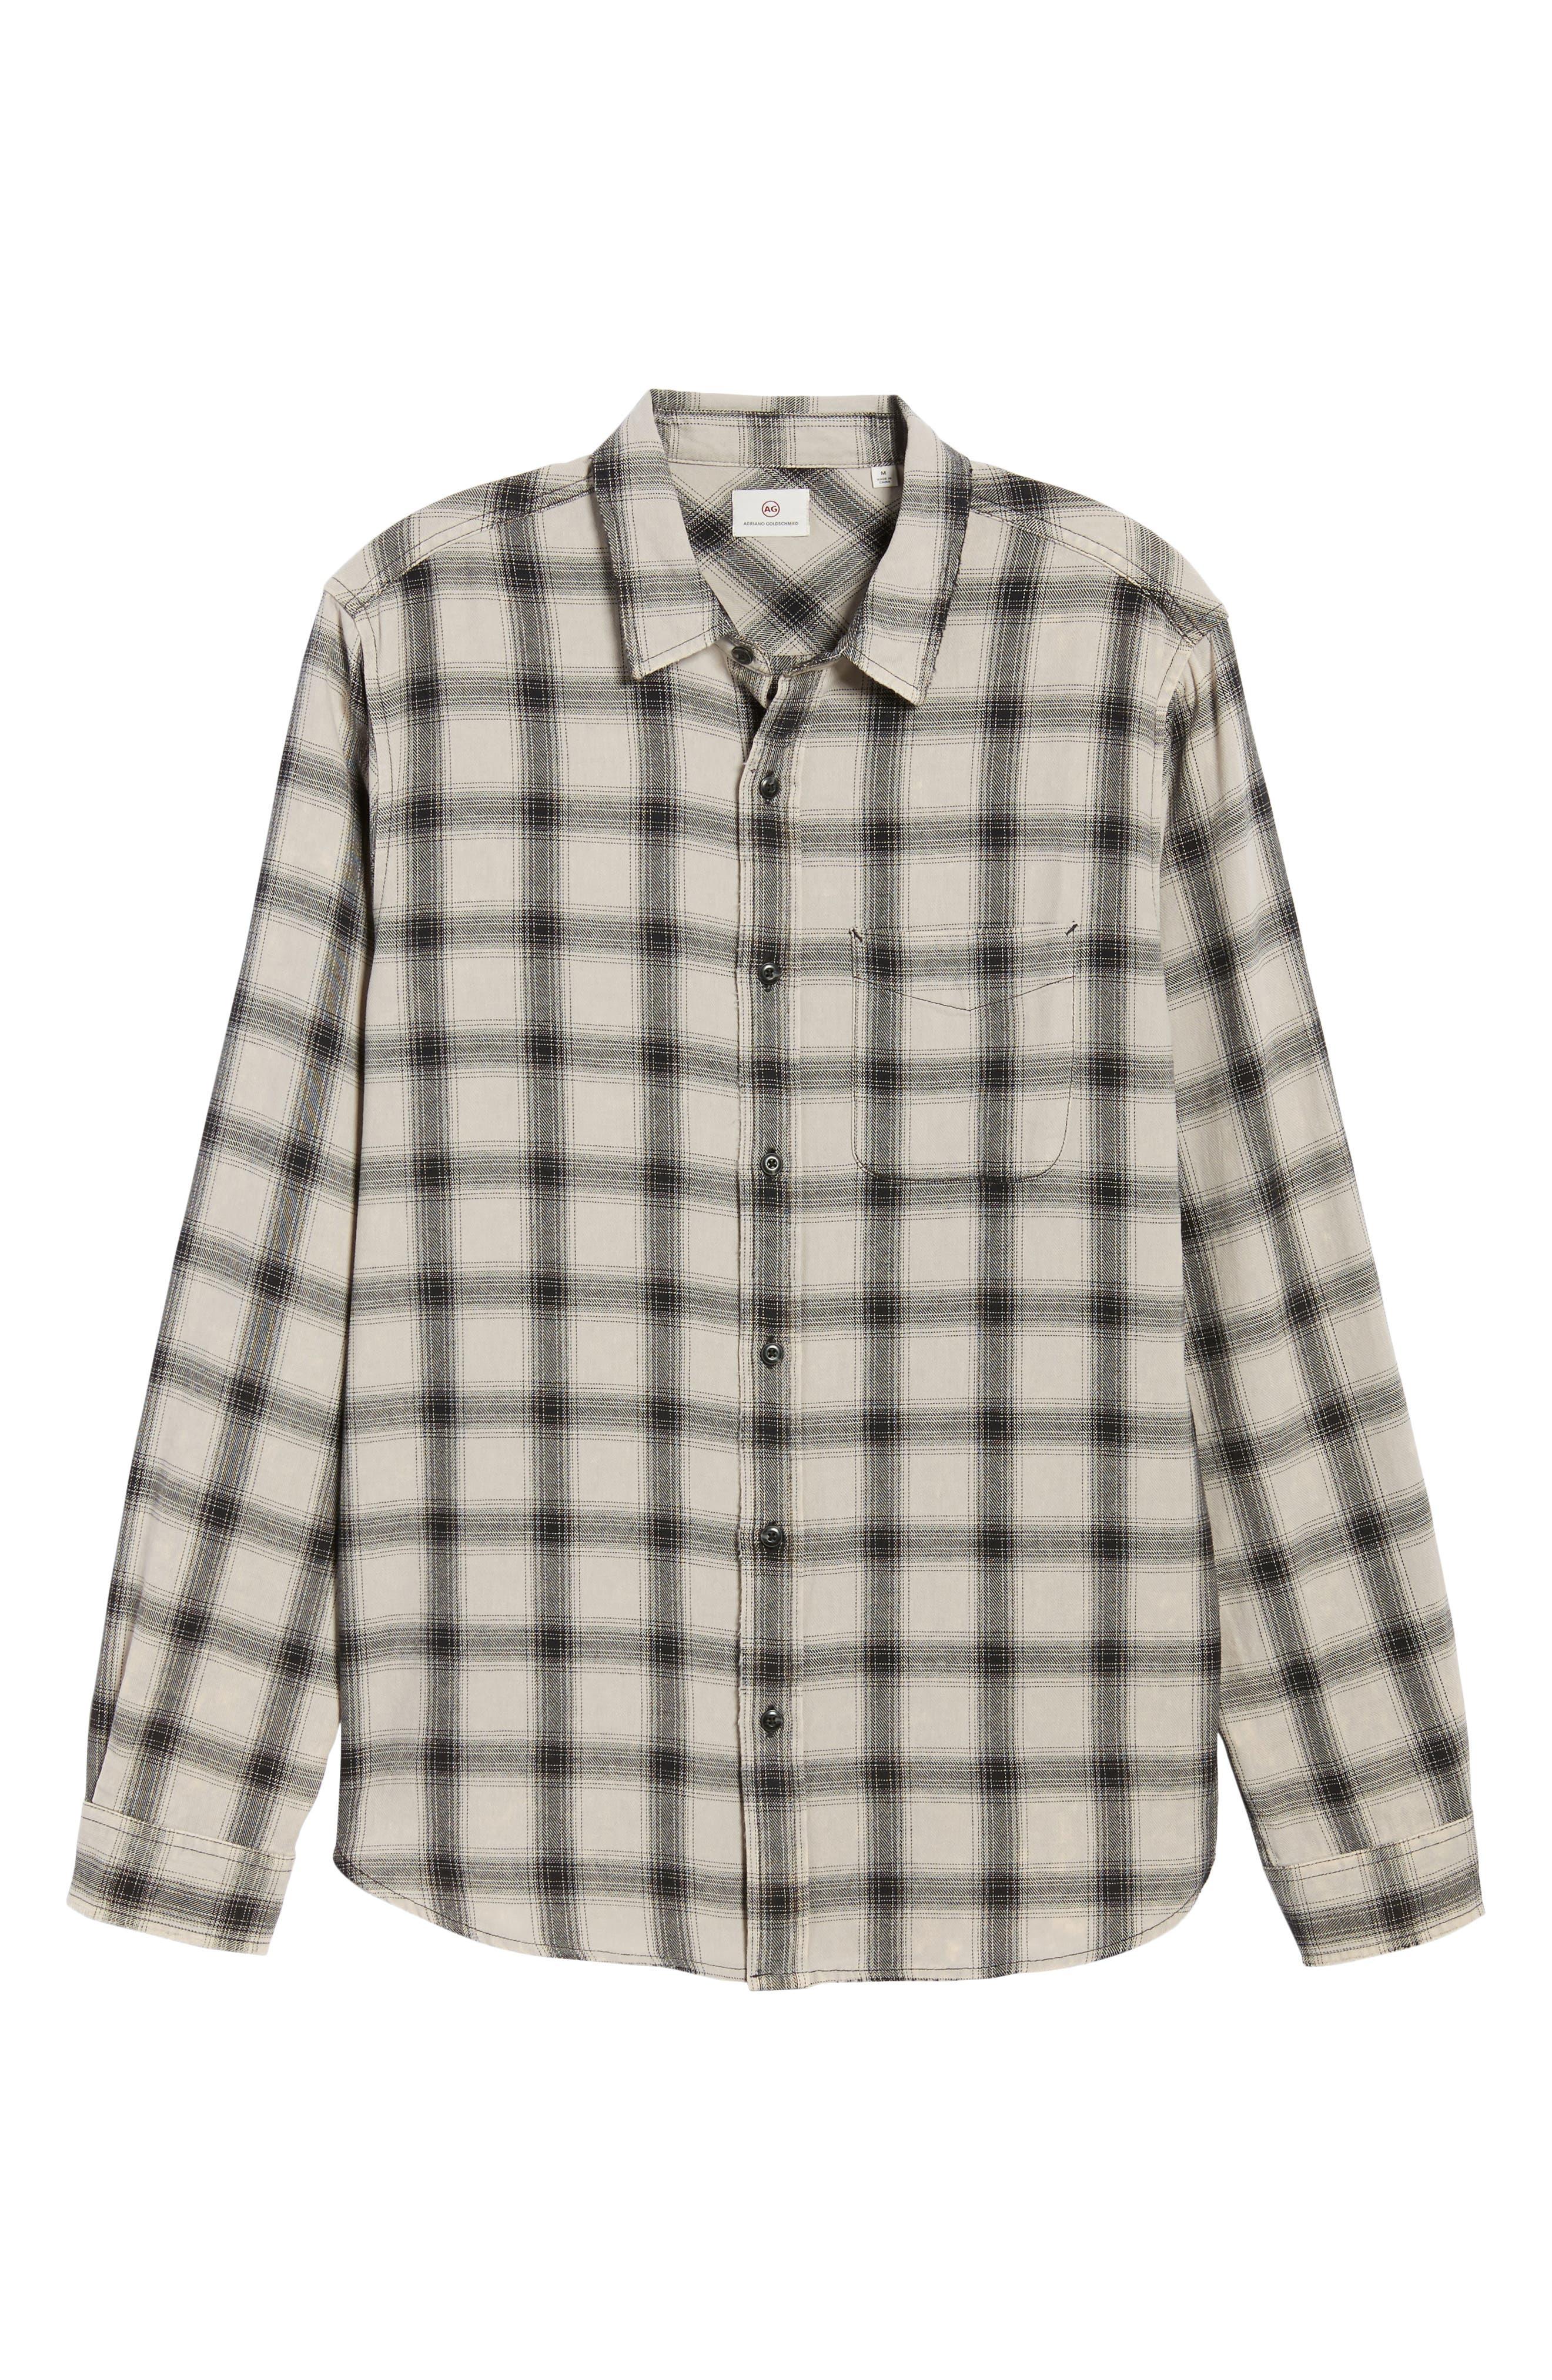 Colton Slim Fit Plaid Sport Shirt,                             Alternate thumbnail 6, color,                             15 Years Mineral Veil/ Black